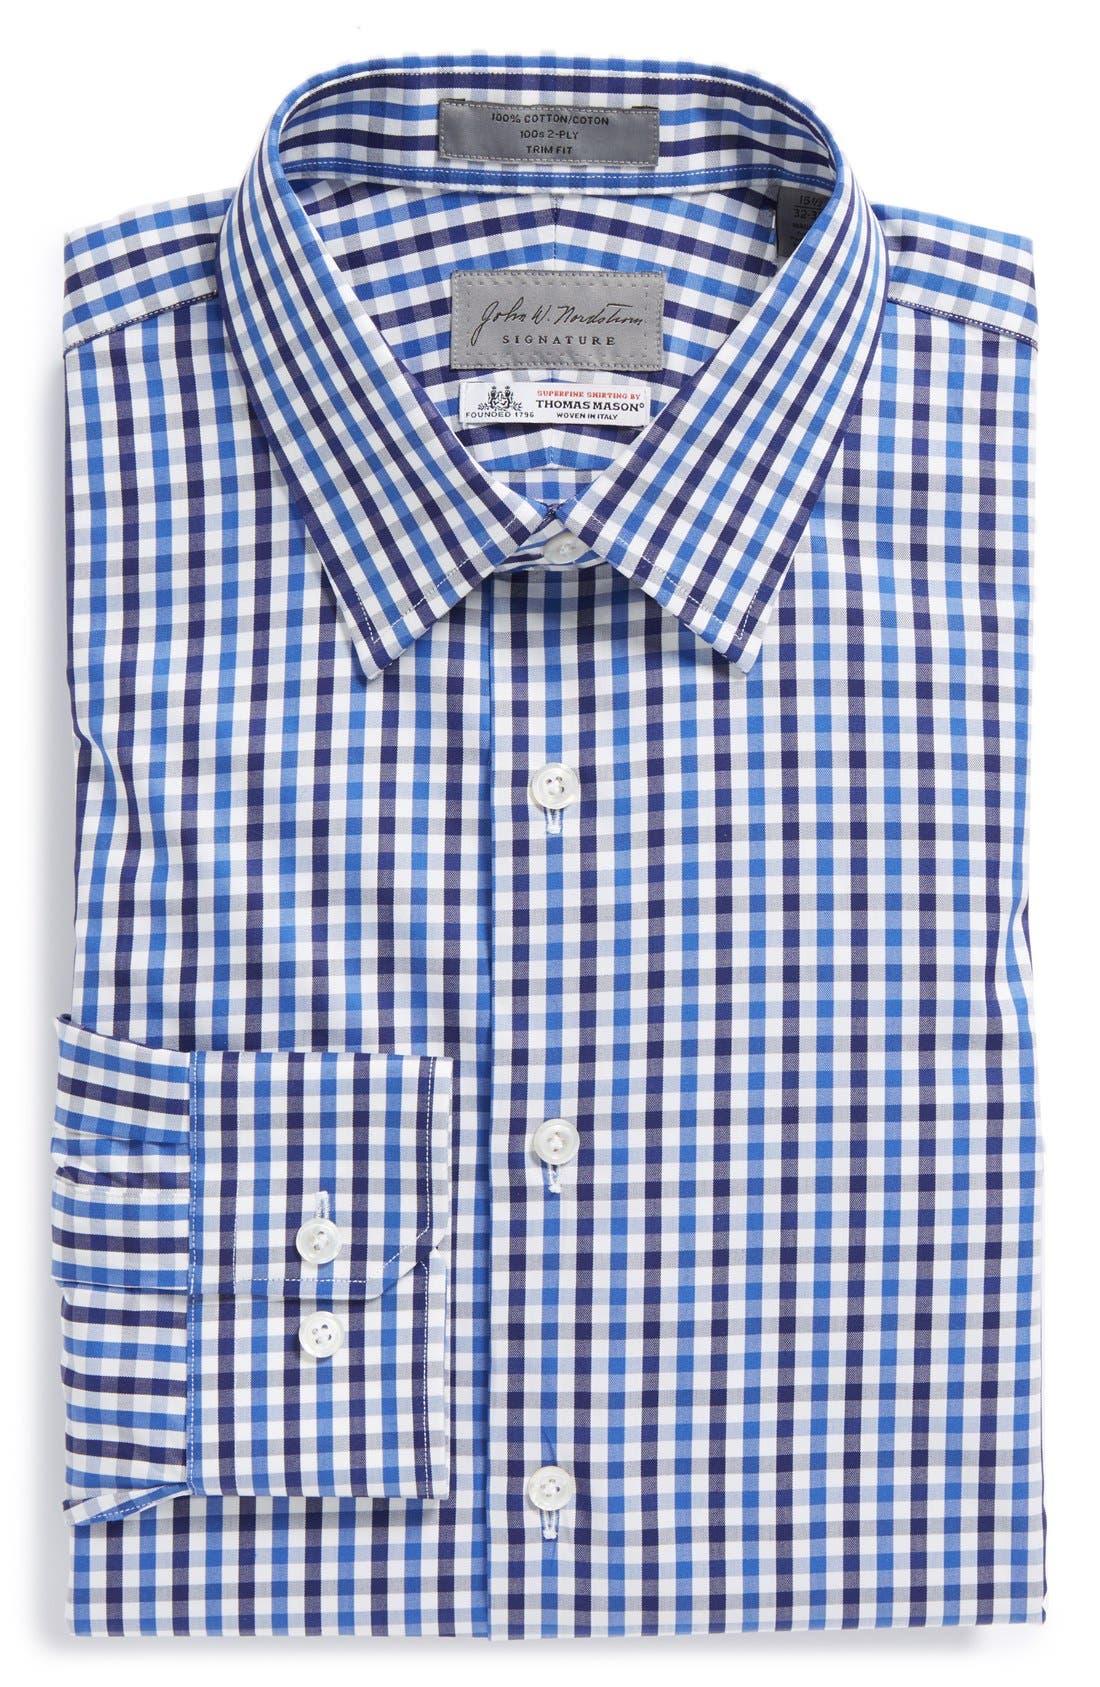 John W Nordstrom<sup>®</sup> Signature Trim Fit Check Dress Shirt,                             Main thumbnail 1, color,                             401